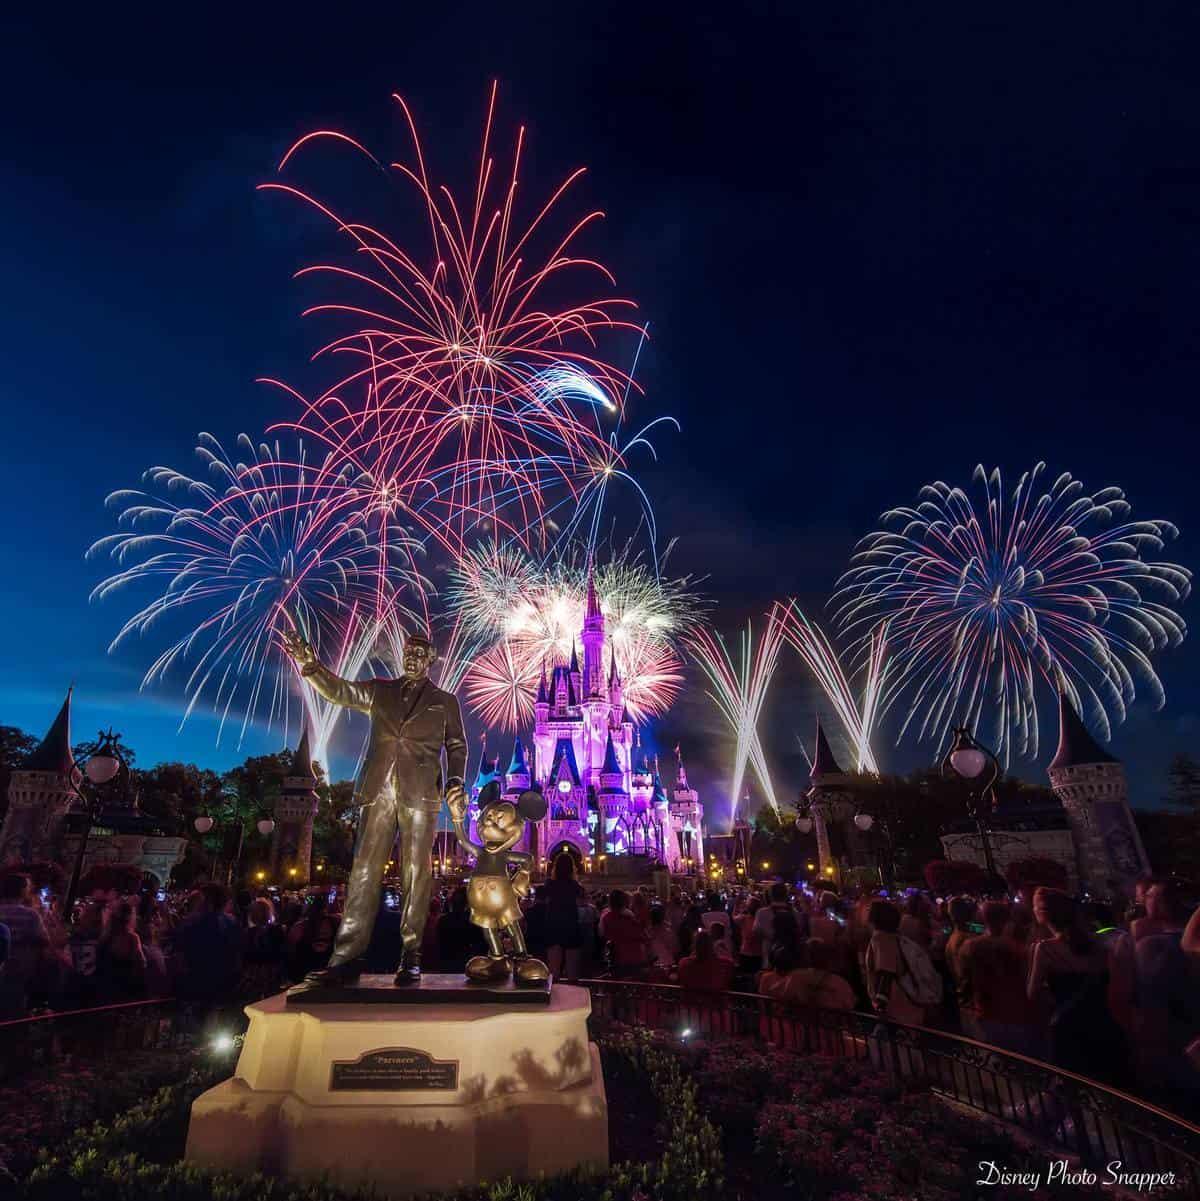 Top 9 Walt Disney World Park Icons